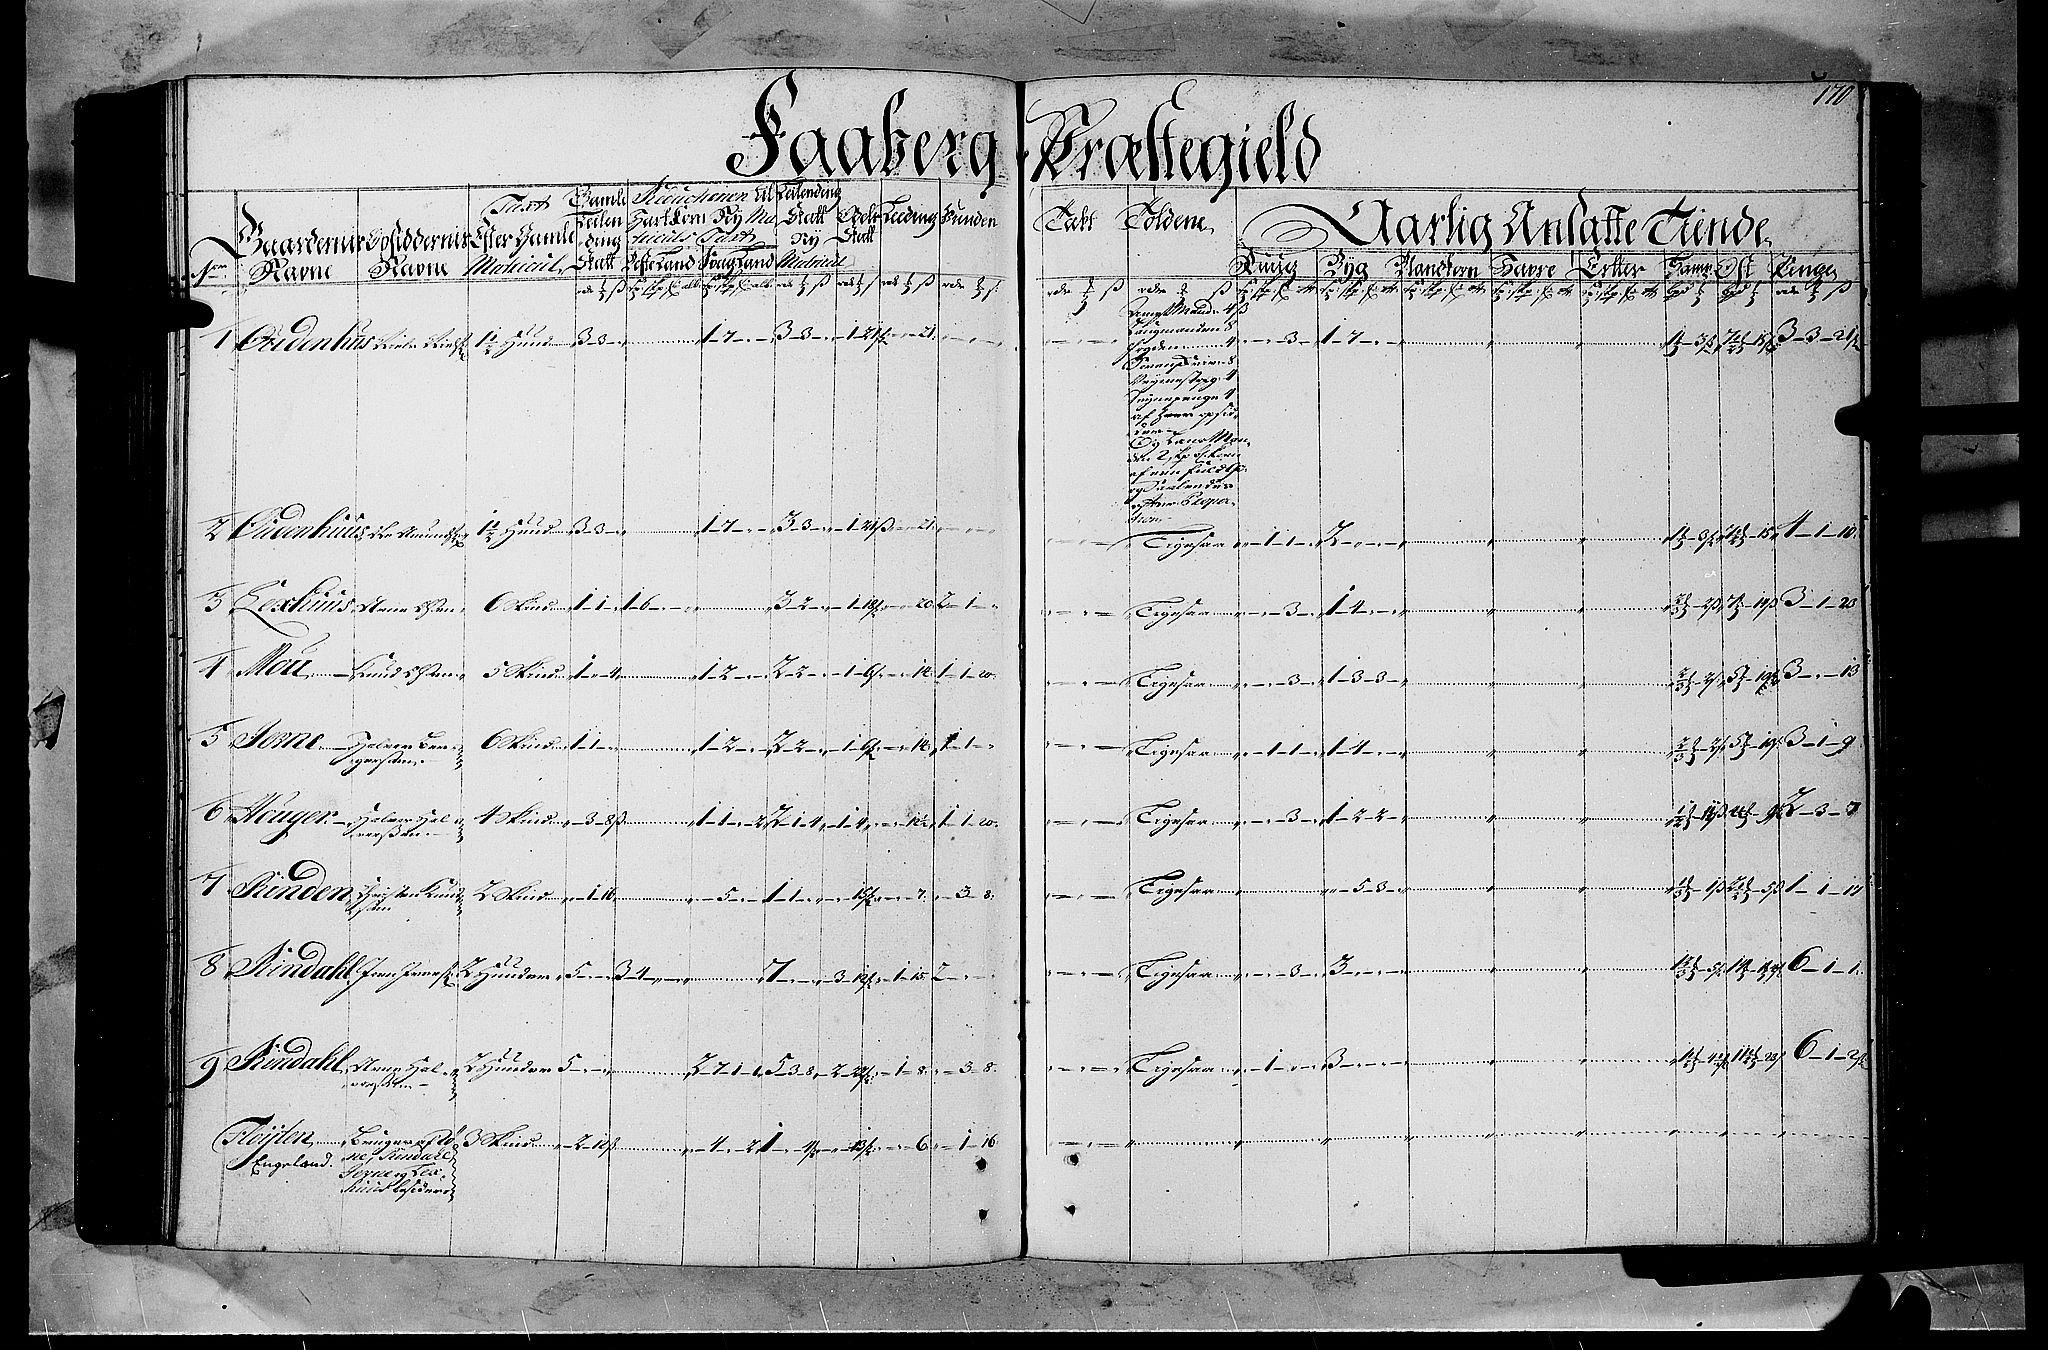 RA, Rentekammeret inntil 1814, Realistisk ordnet avdeling, N/Nb/Nbf/L0108: Gudbrandsdalen matrikkelprotokoll, 1723, s. 169b-170a